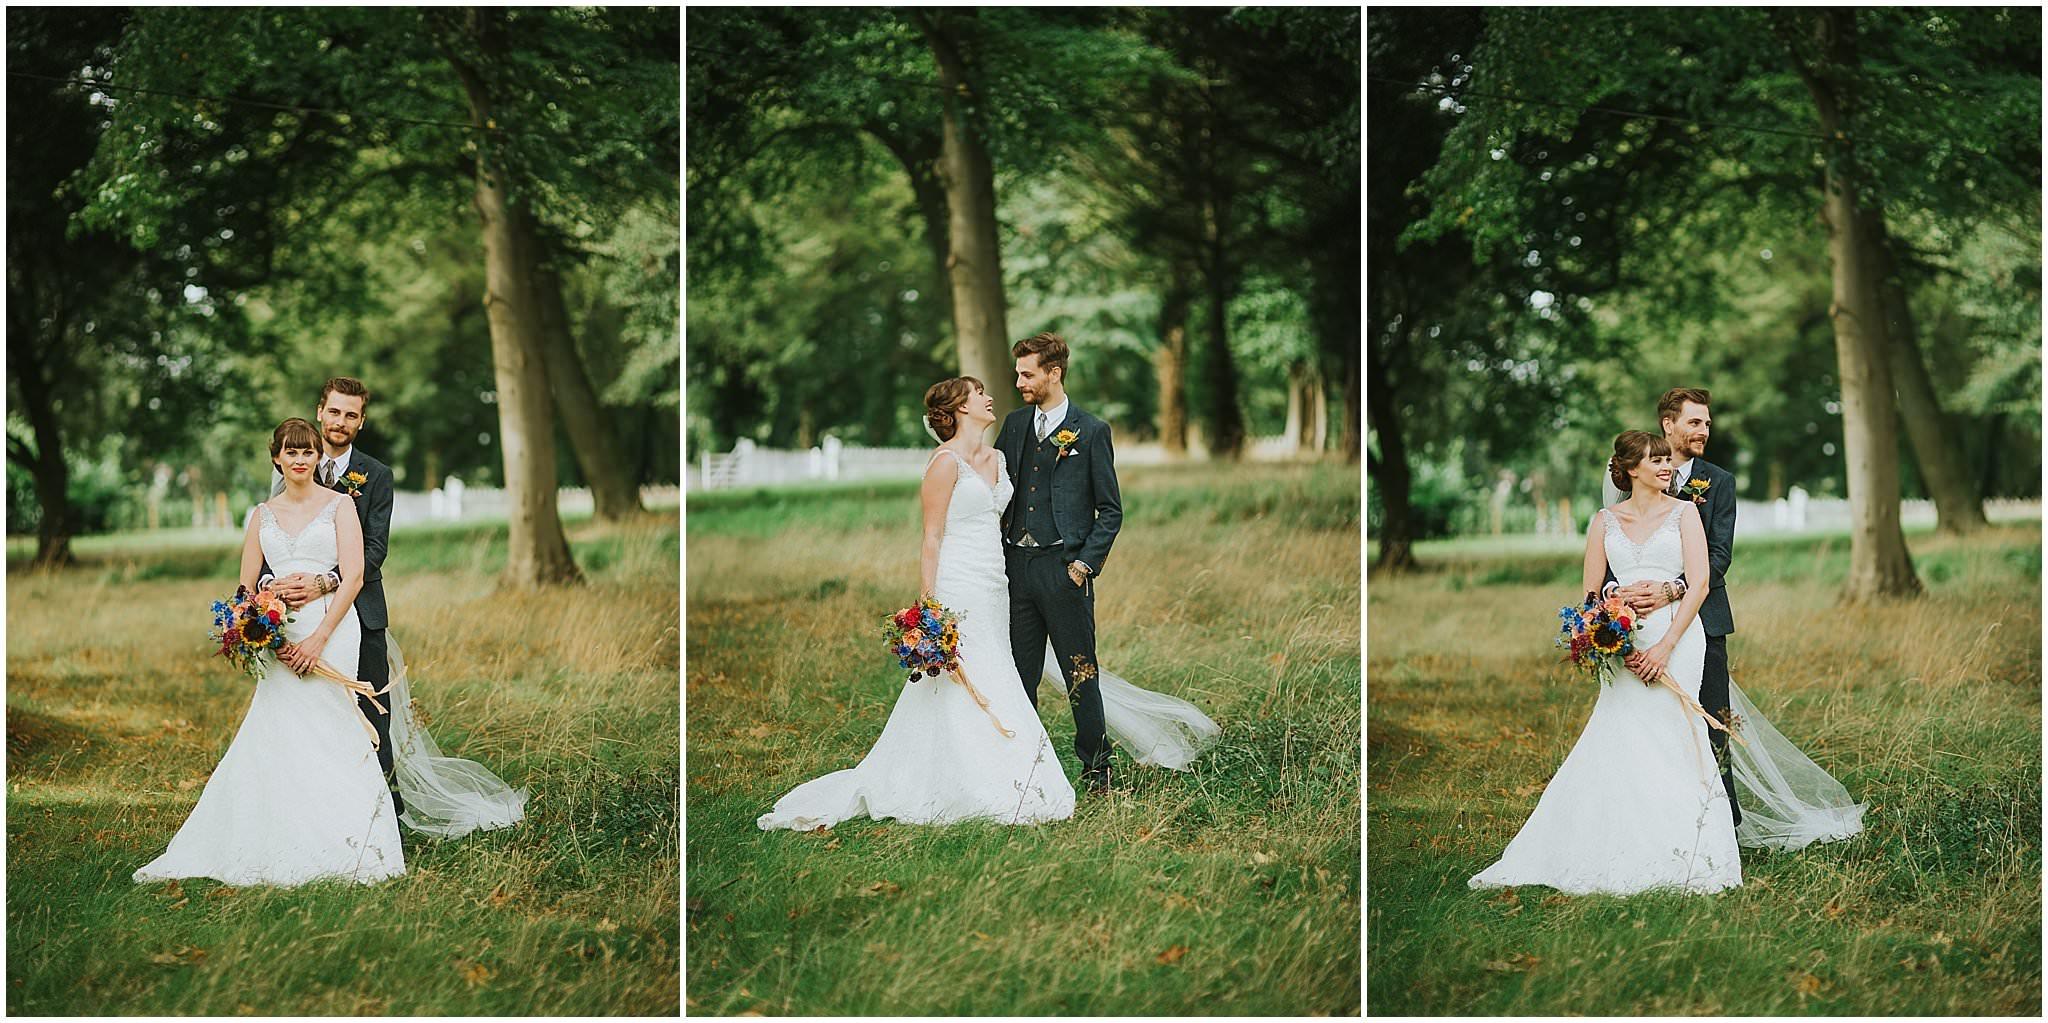 Orchardleigh house wedding photographer_0794